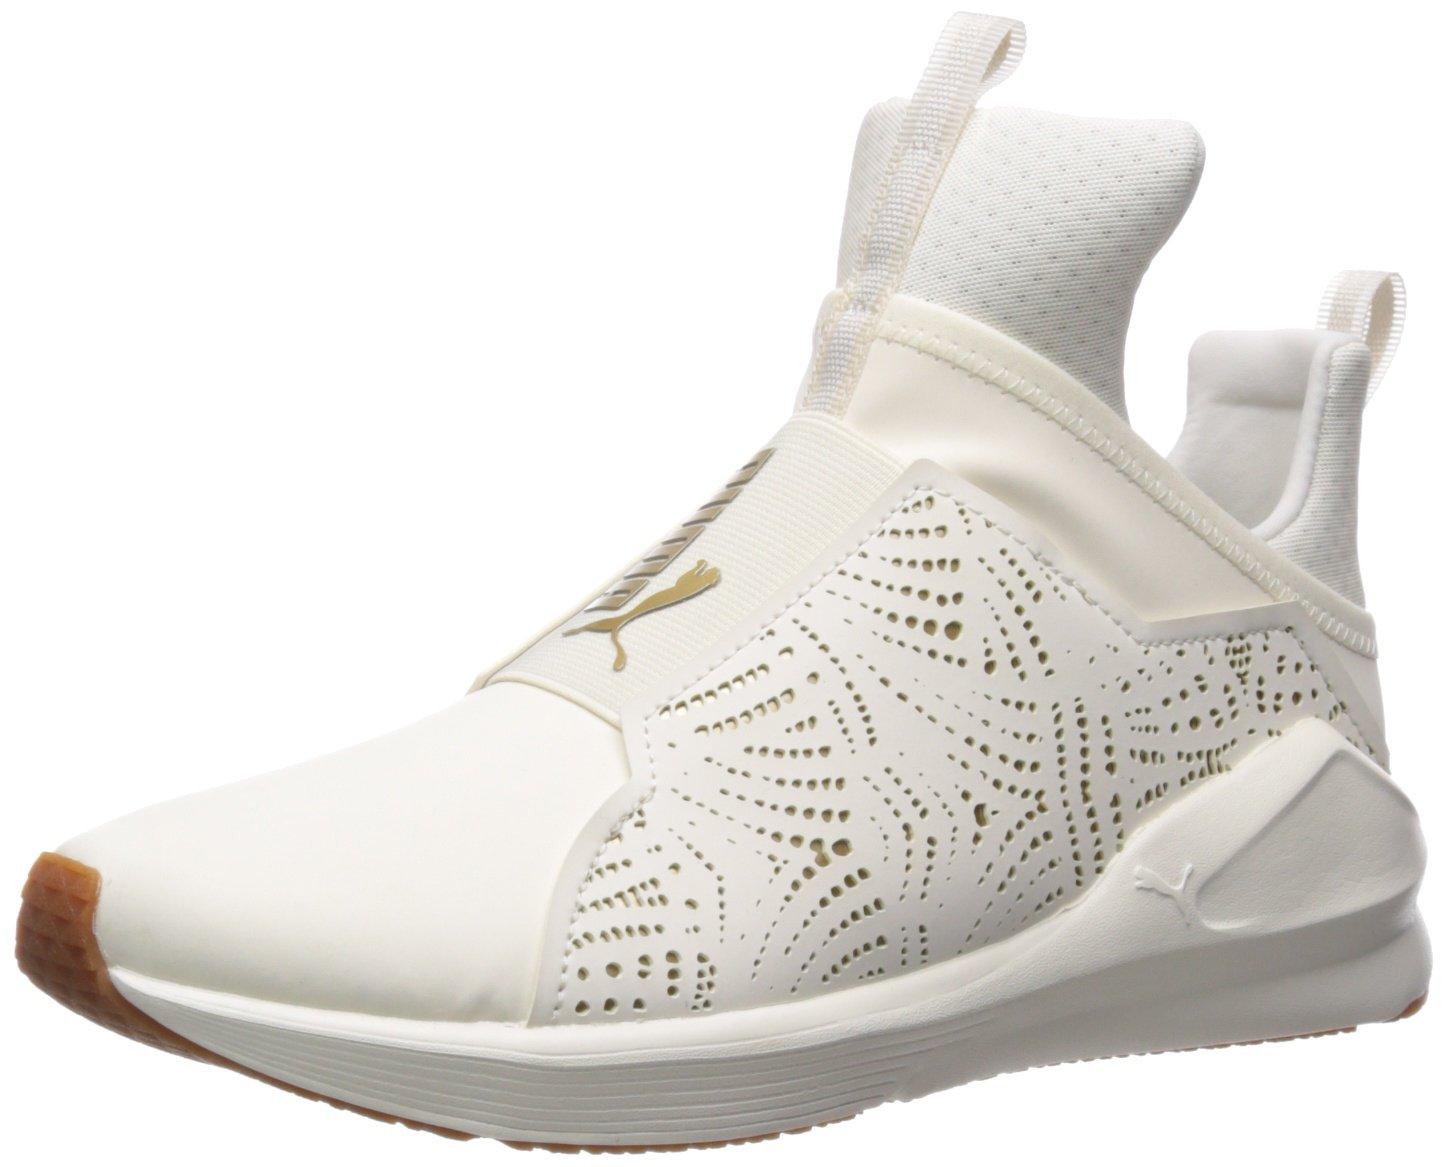 san francisco edbc5 208c0 PUMA Women s Fierce Fierce Fierce Lasercut Wn Sneaker B071K695HV 9 B(M)  US Whisper White-gold 570e93